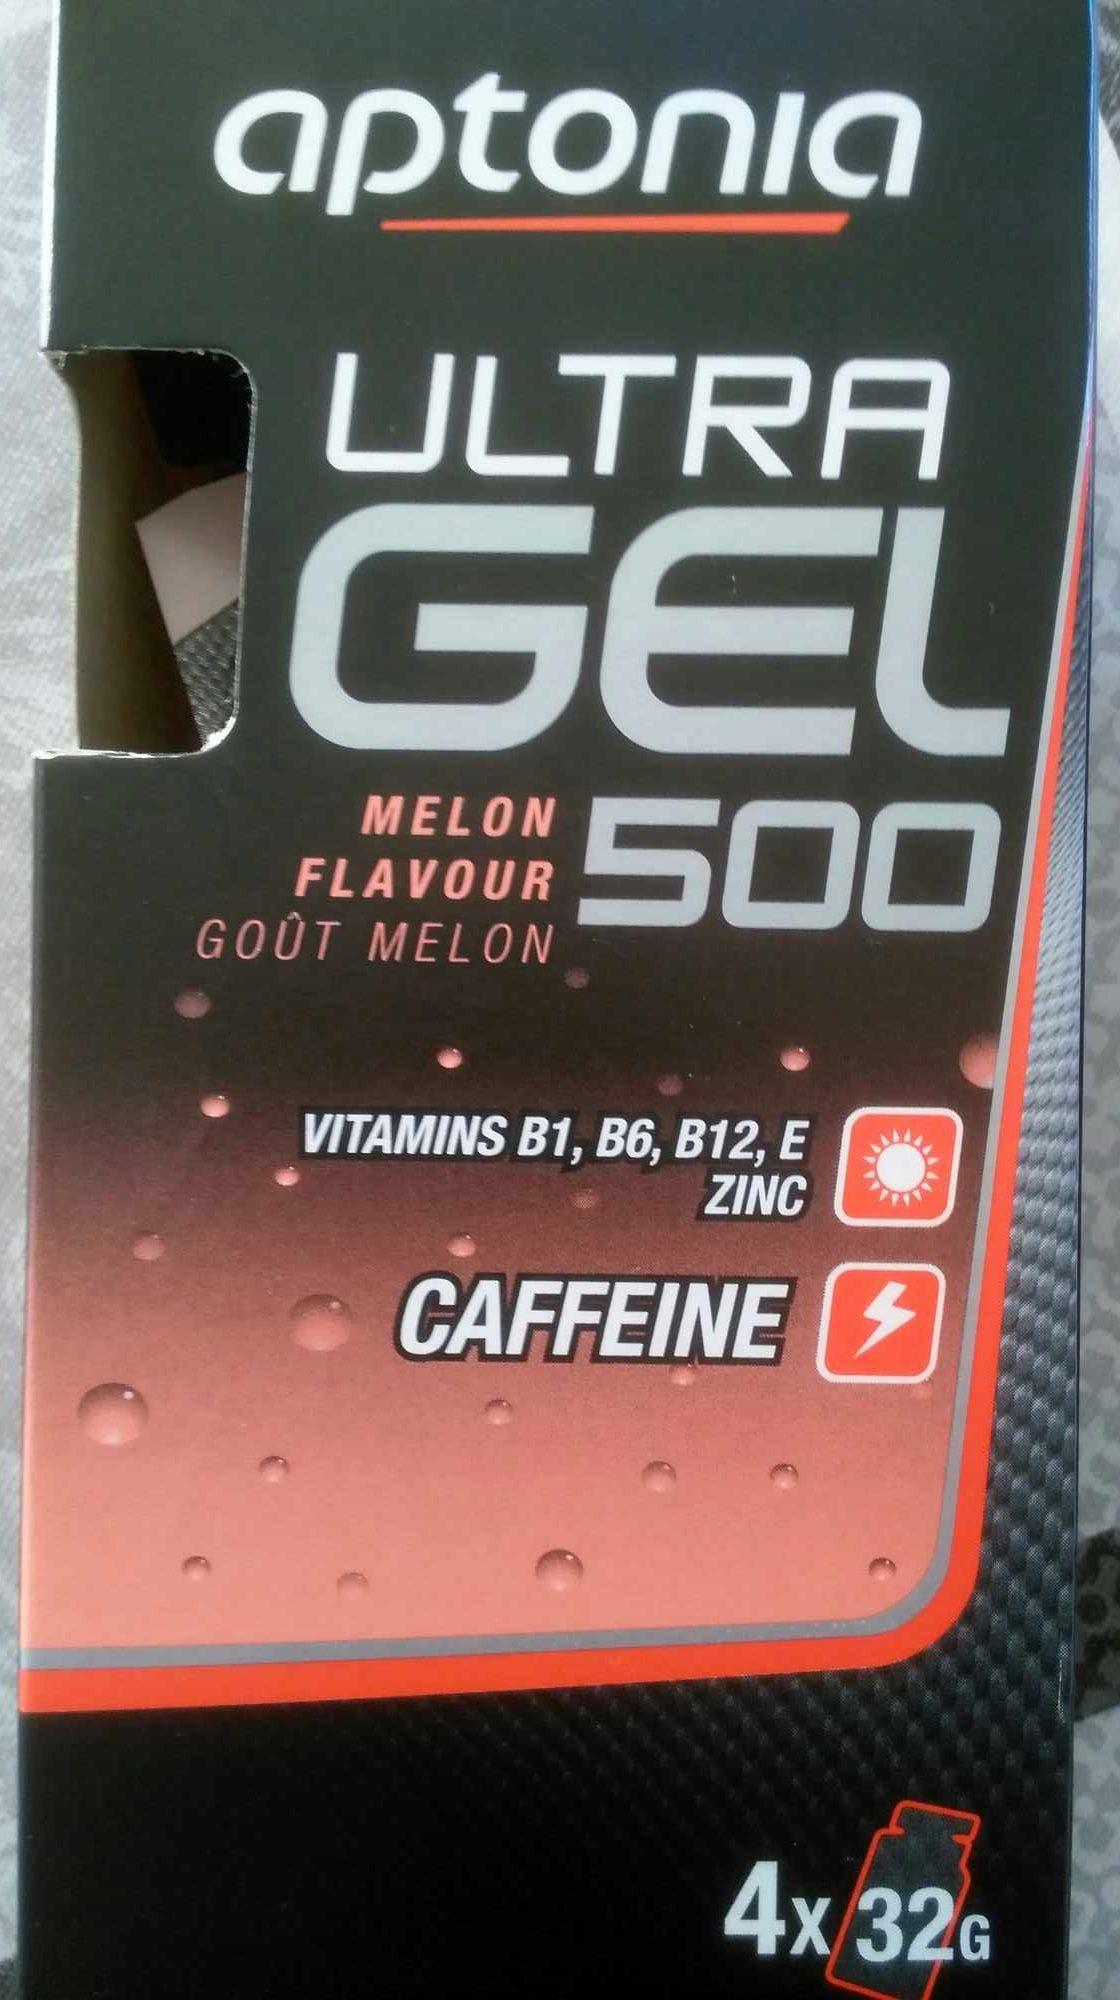 Ultra Gel 500 Goût Melon - Produit - fr